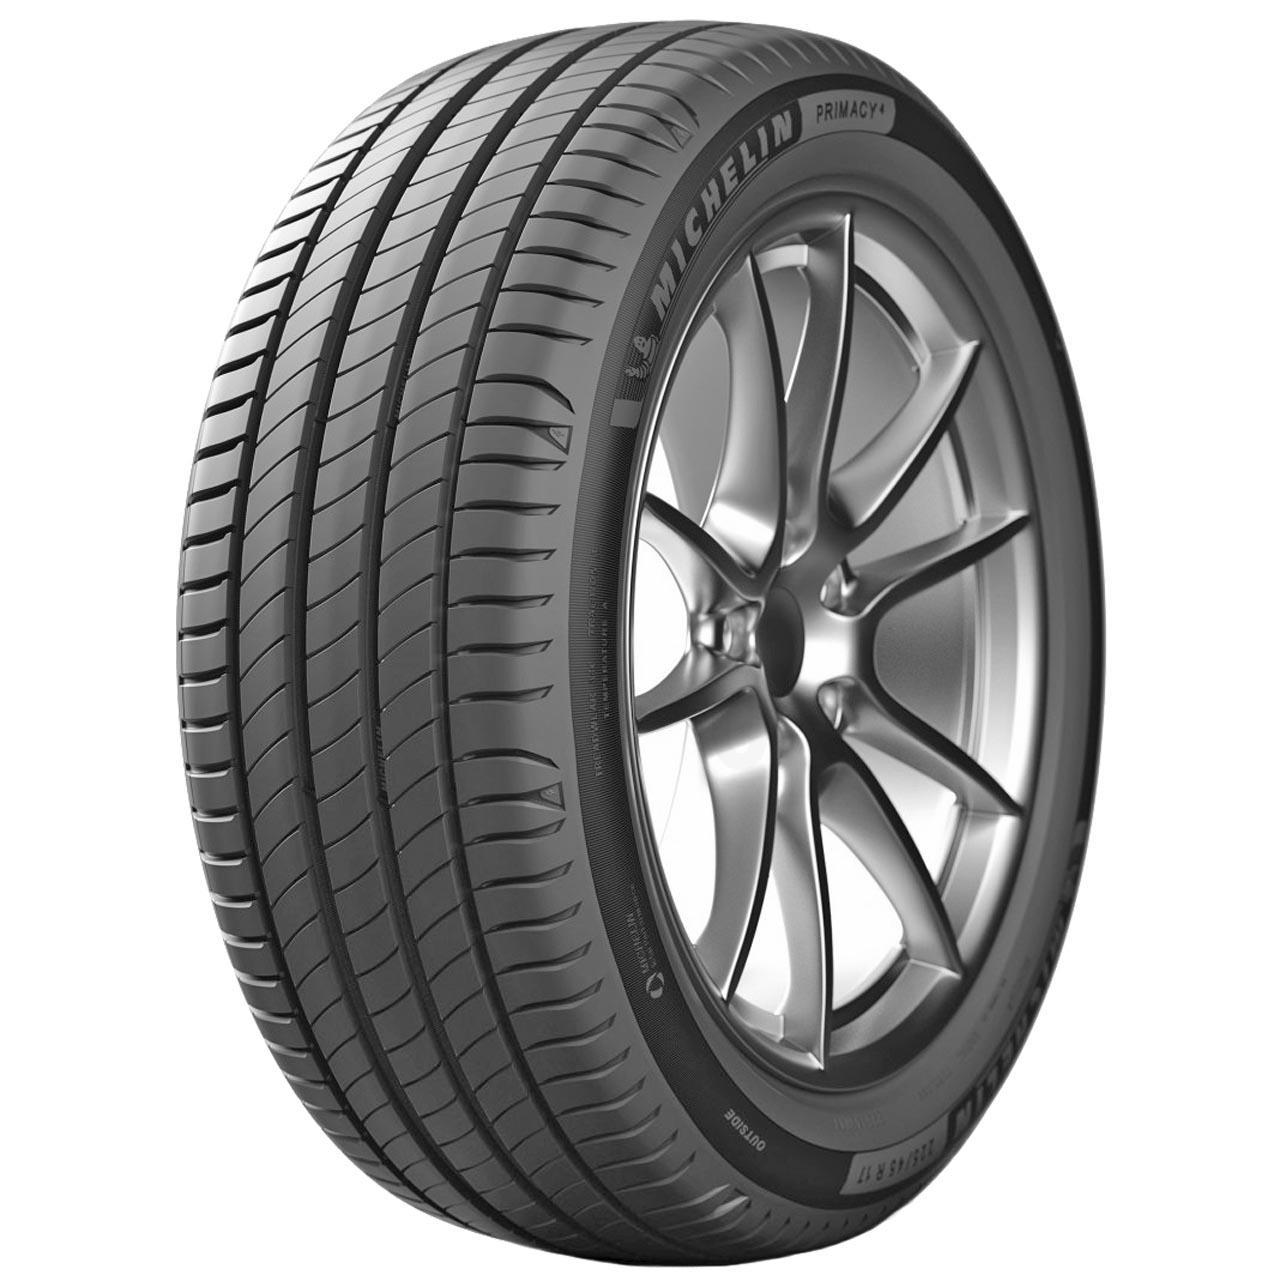 Michelin Primacy 4 195/65R15 91H